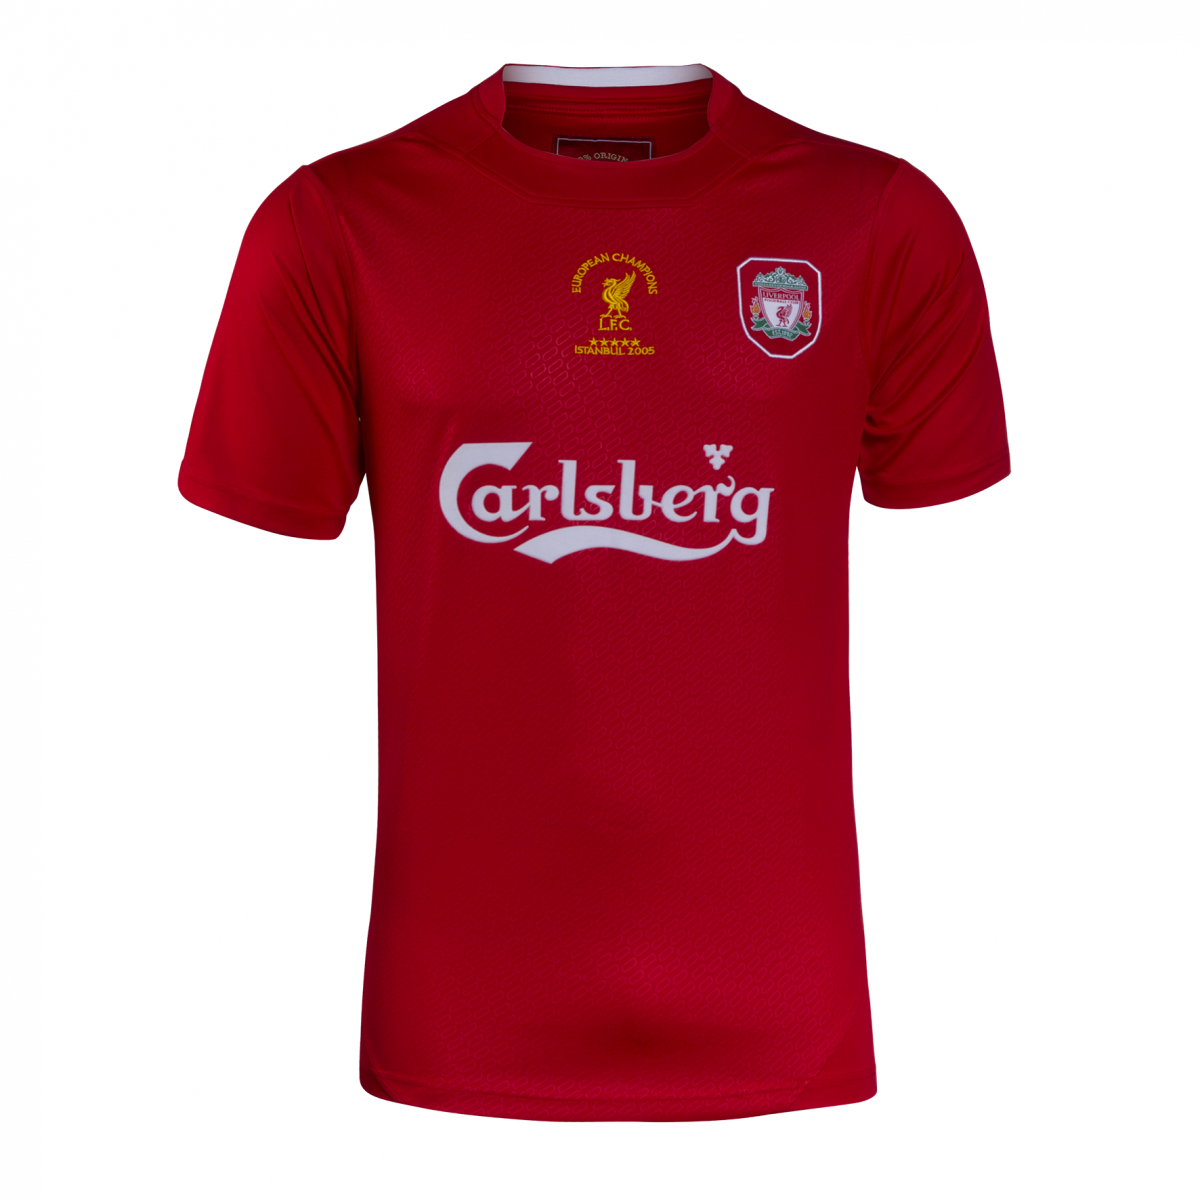 5ffd02e7d LFC Retro Istanbul 05 Shirt